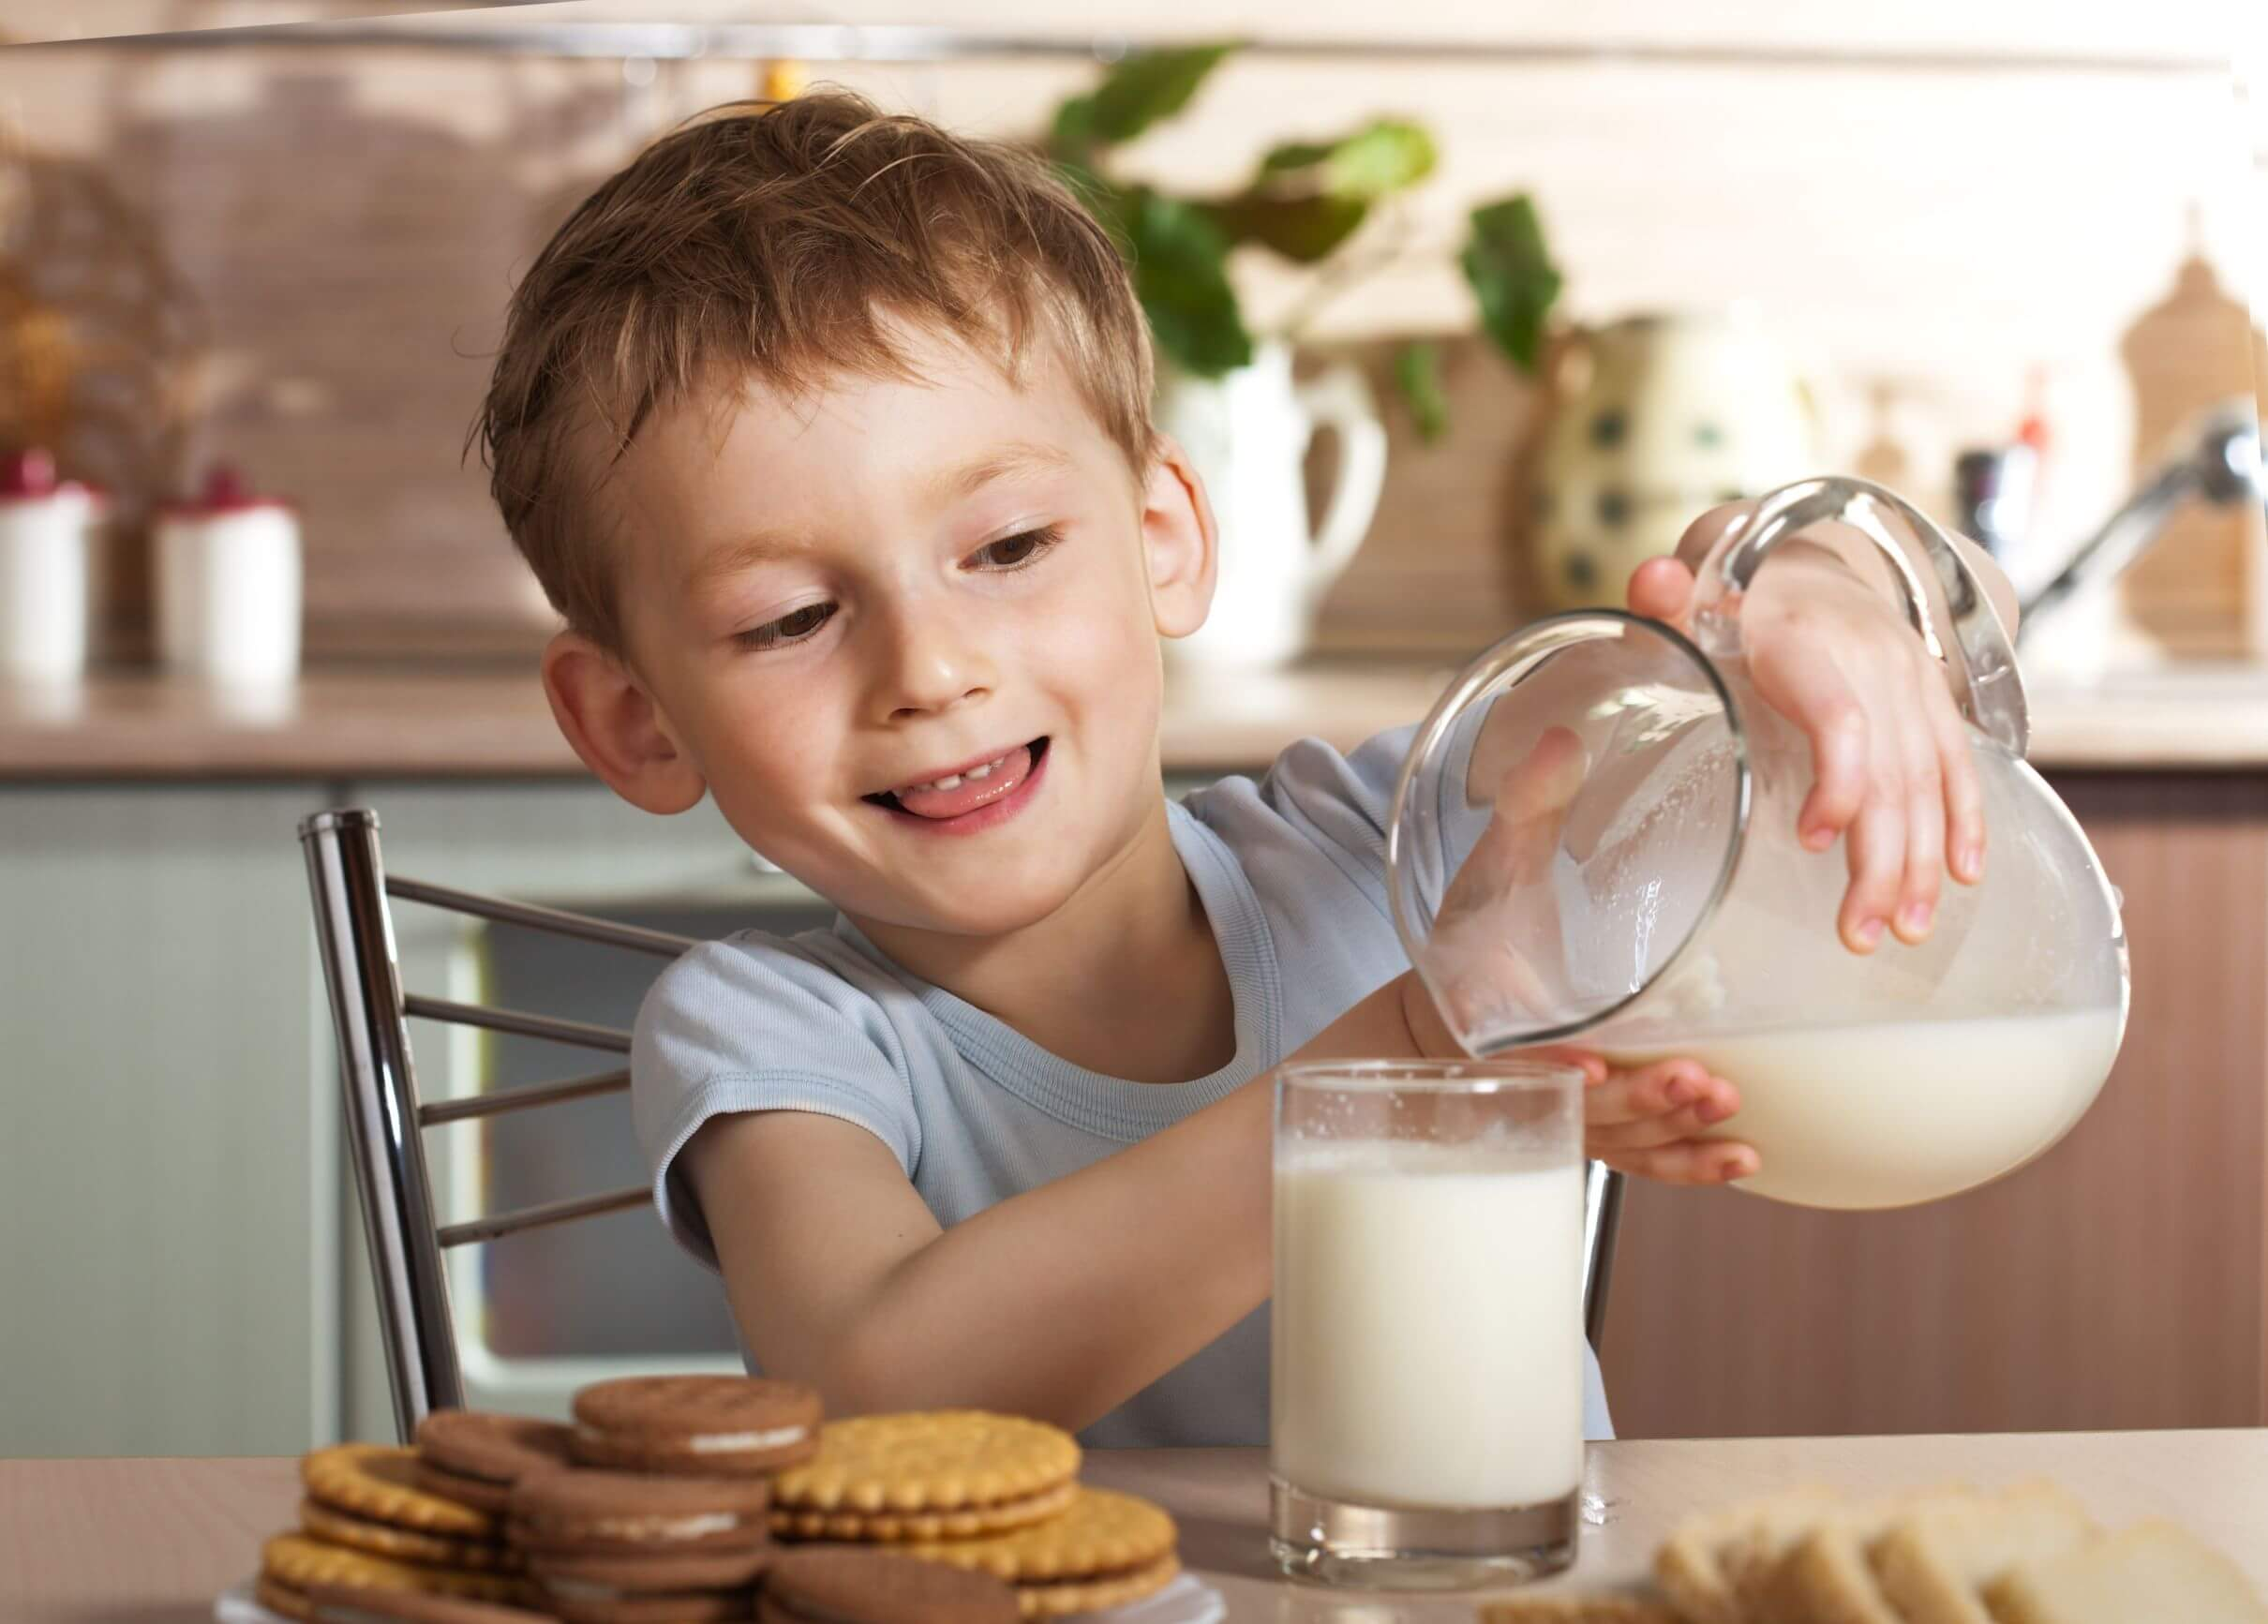 Chlapec si nalieva mlieko do pohára